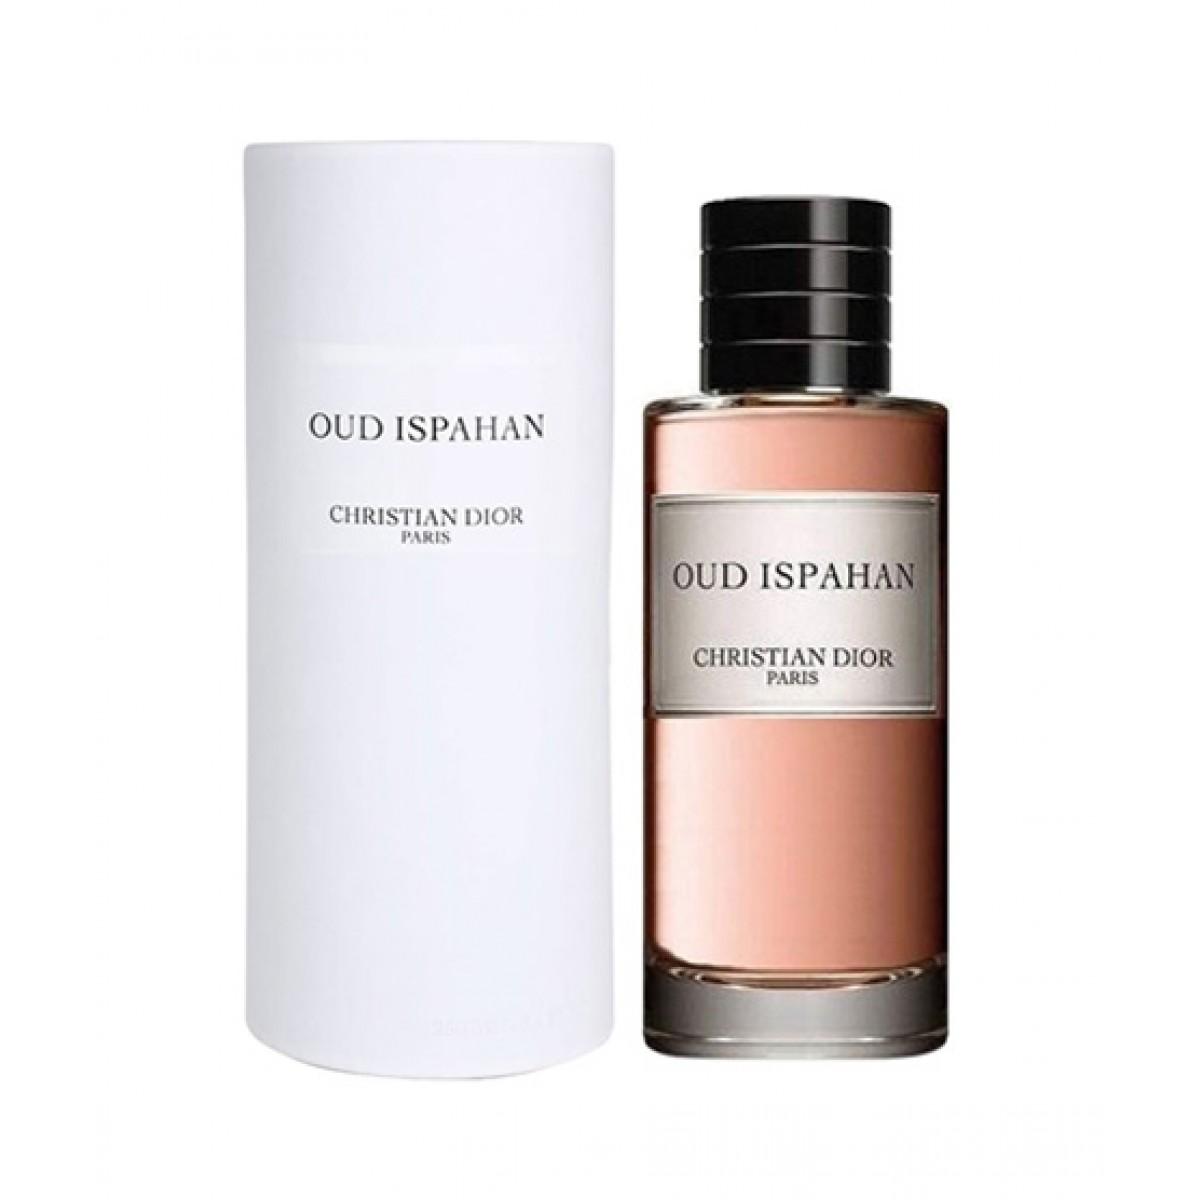 Reviews For Christian Dior Oud Ispahan Eau De Parfum Price In